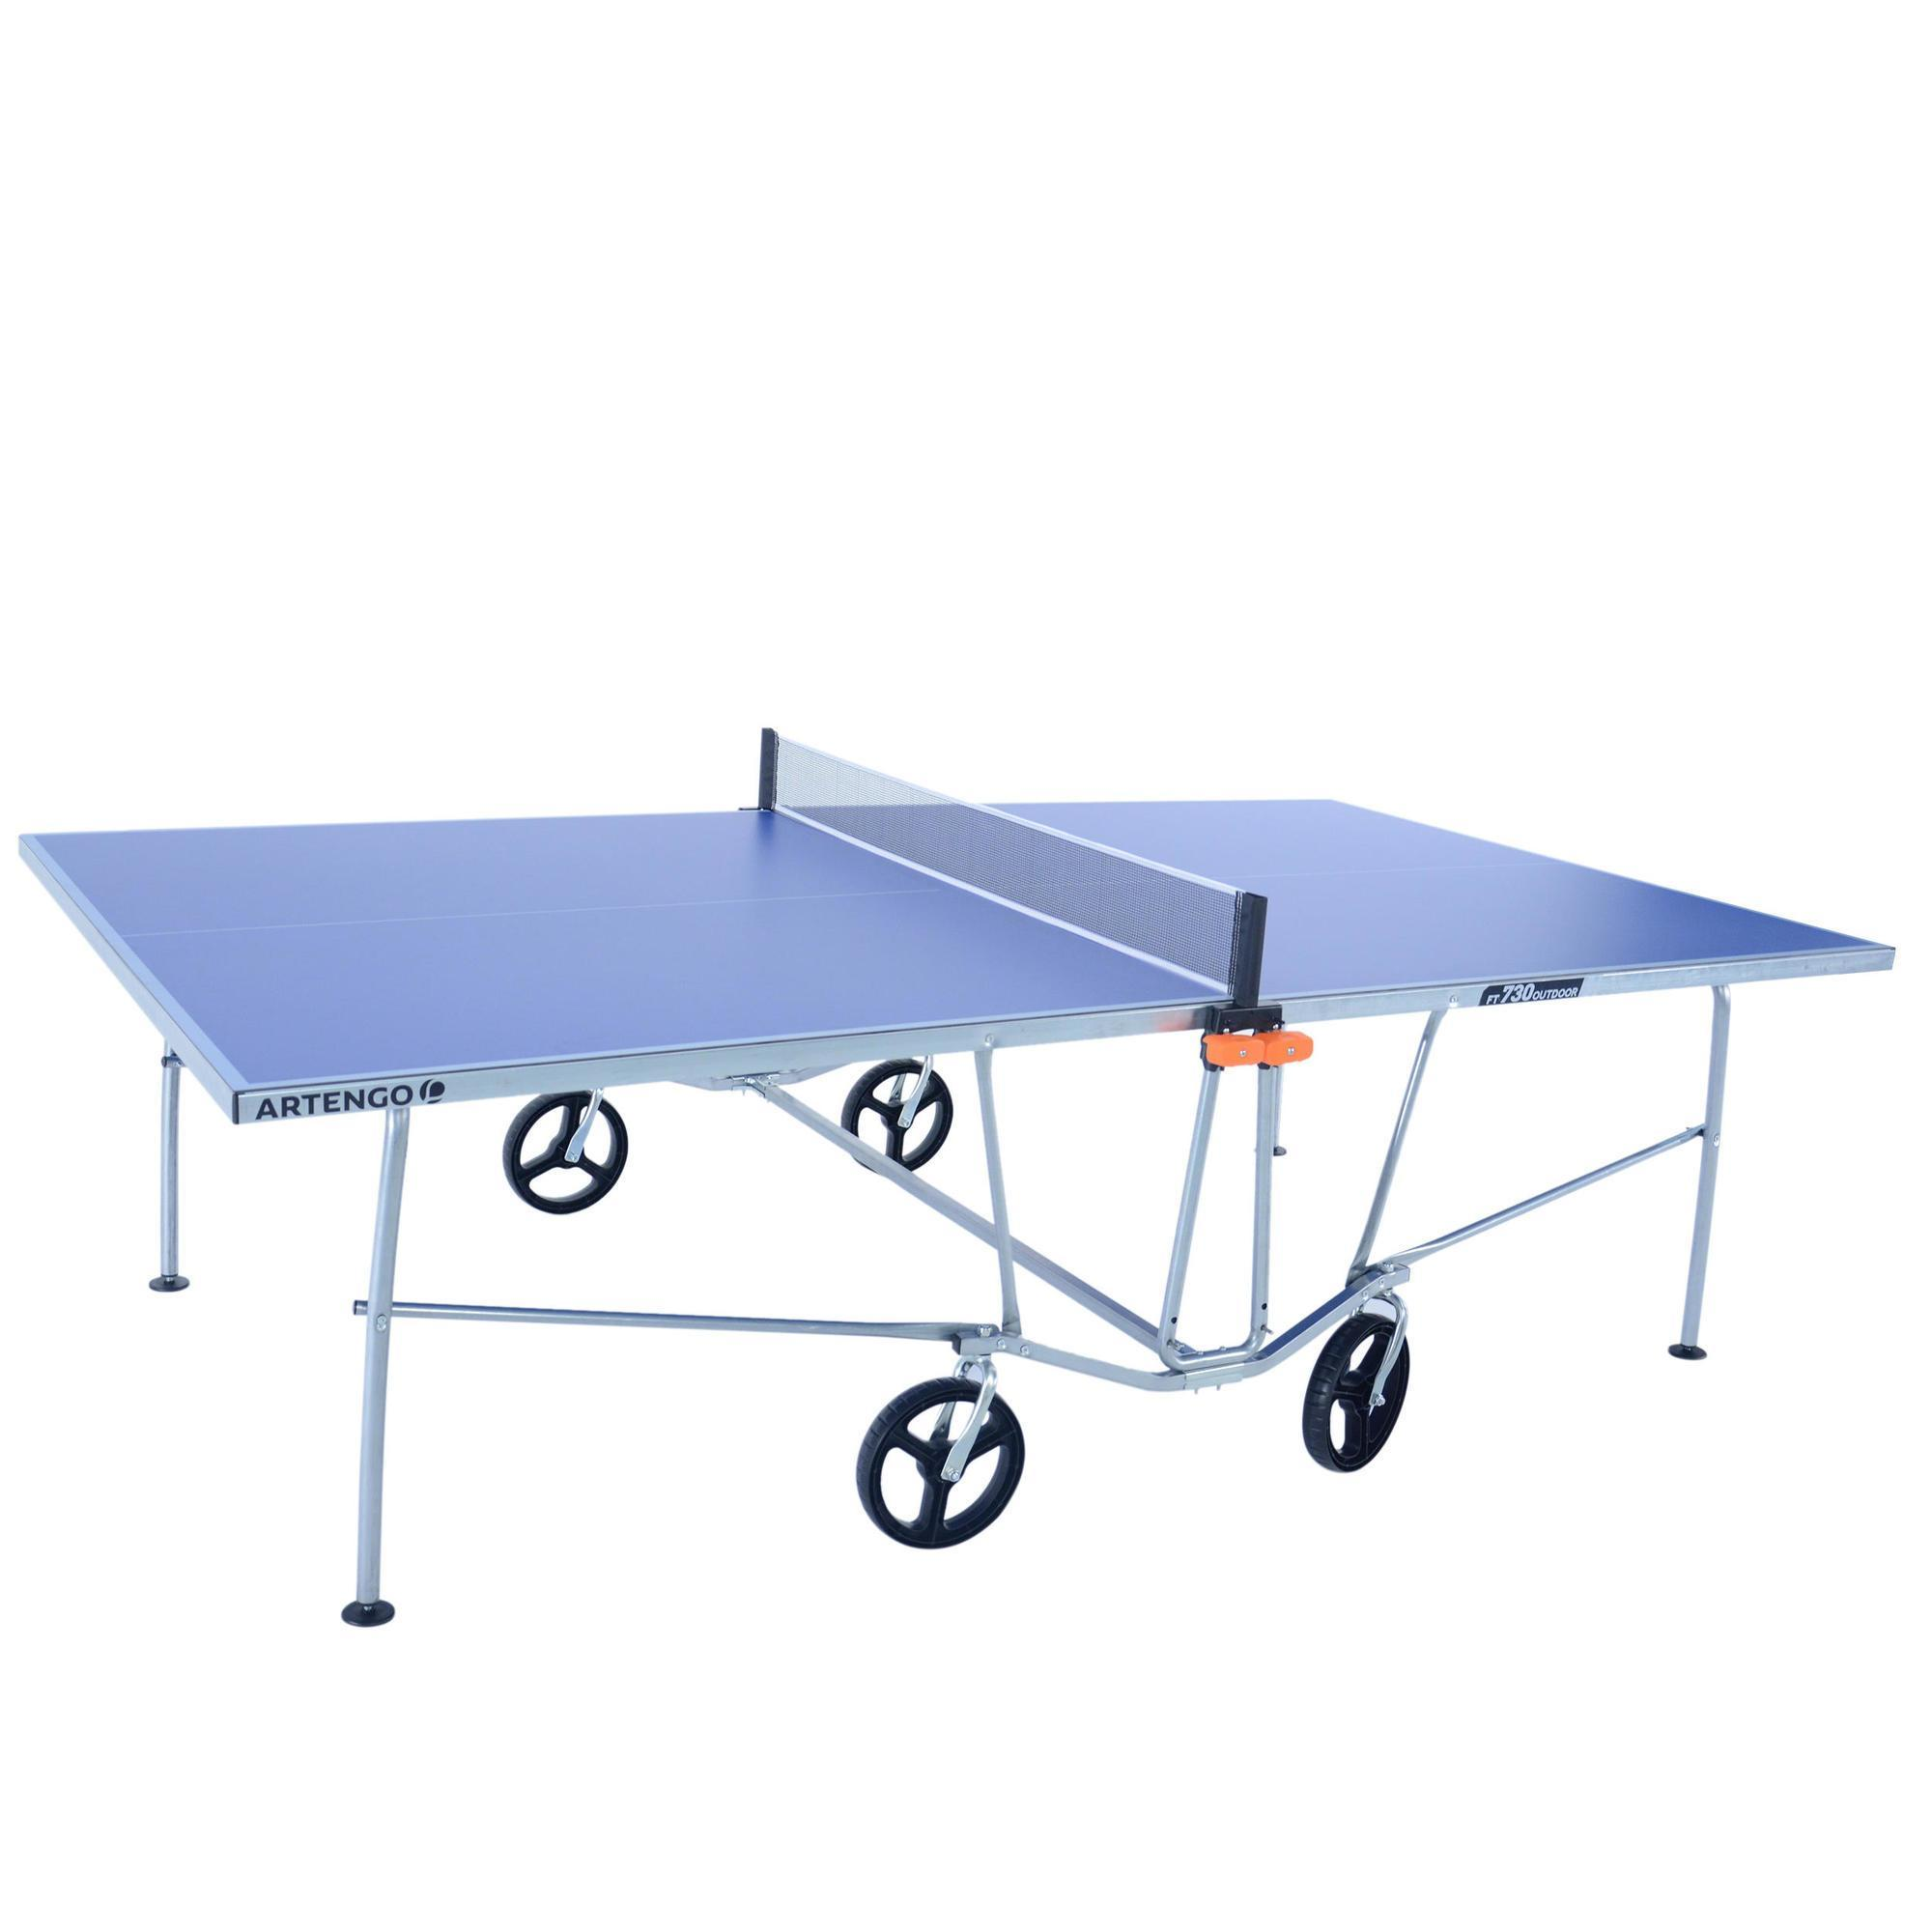 table de ping pong ext rieure ft730 artengo. Black Bedroom Furniture Sets. Home Design Ideas